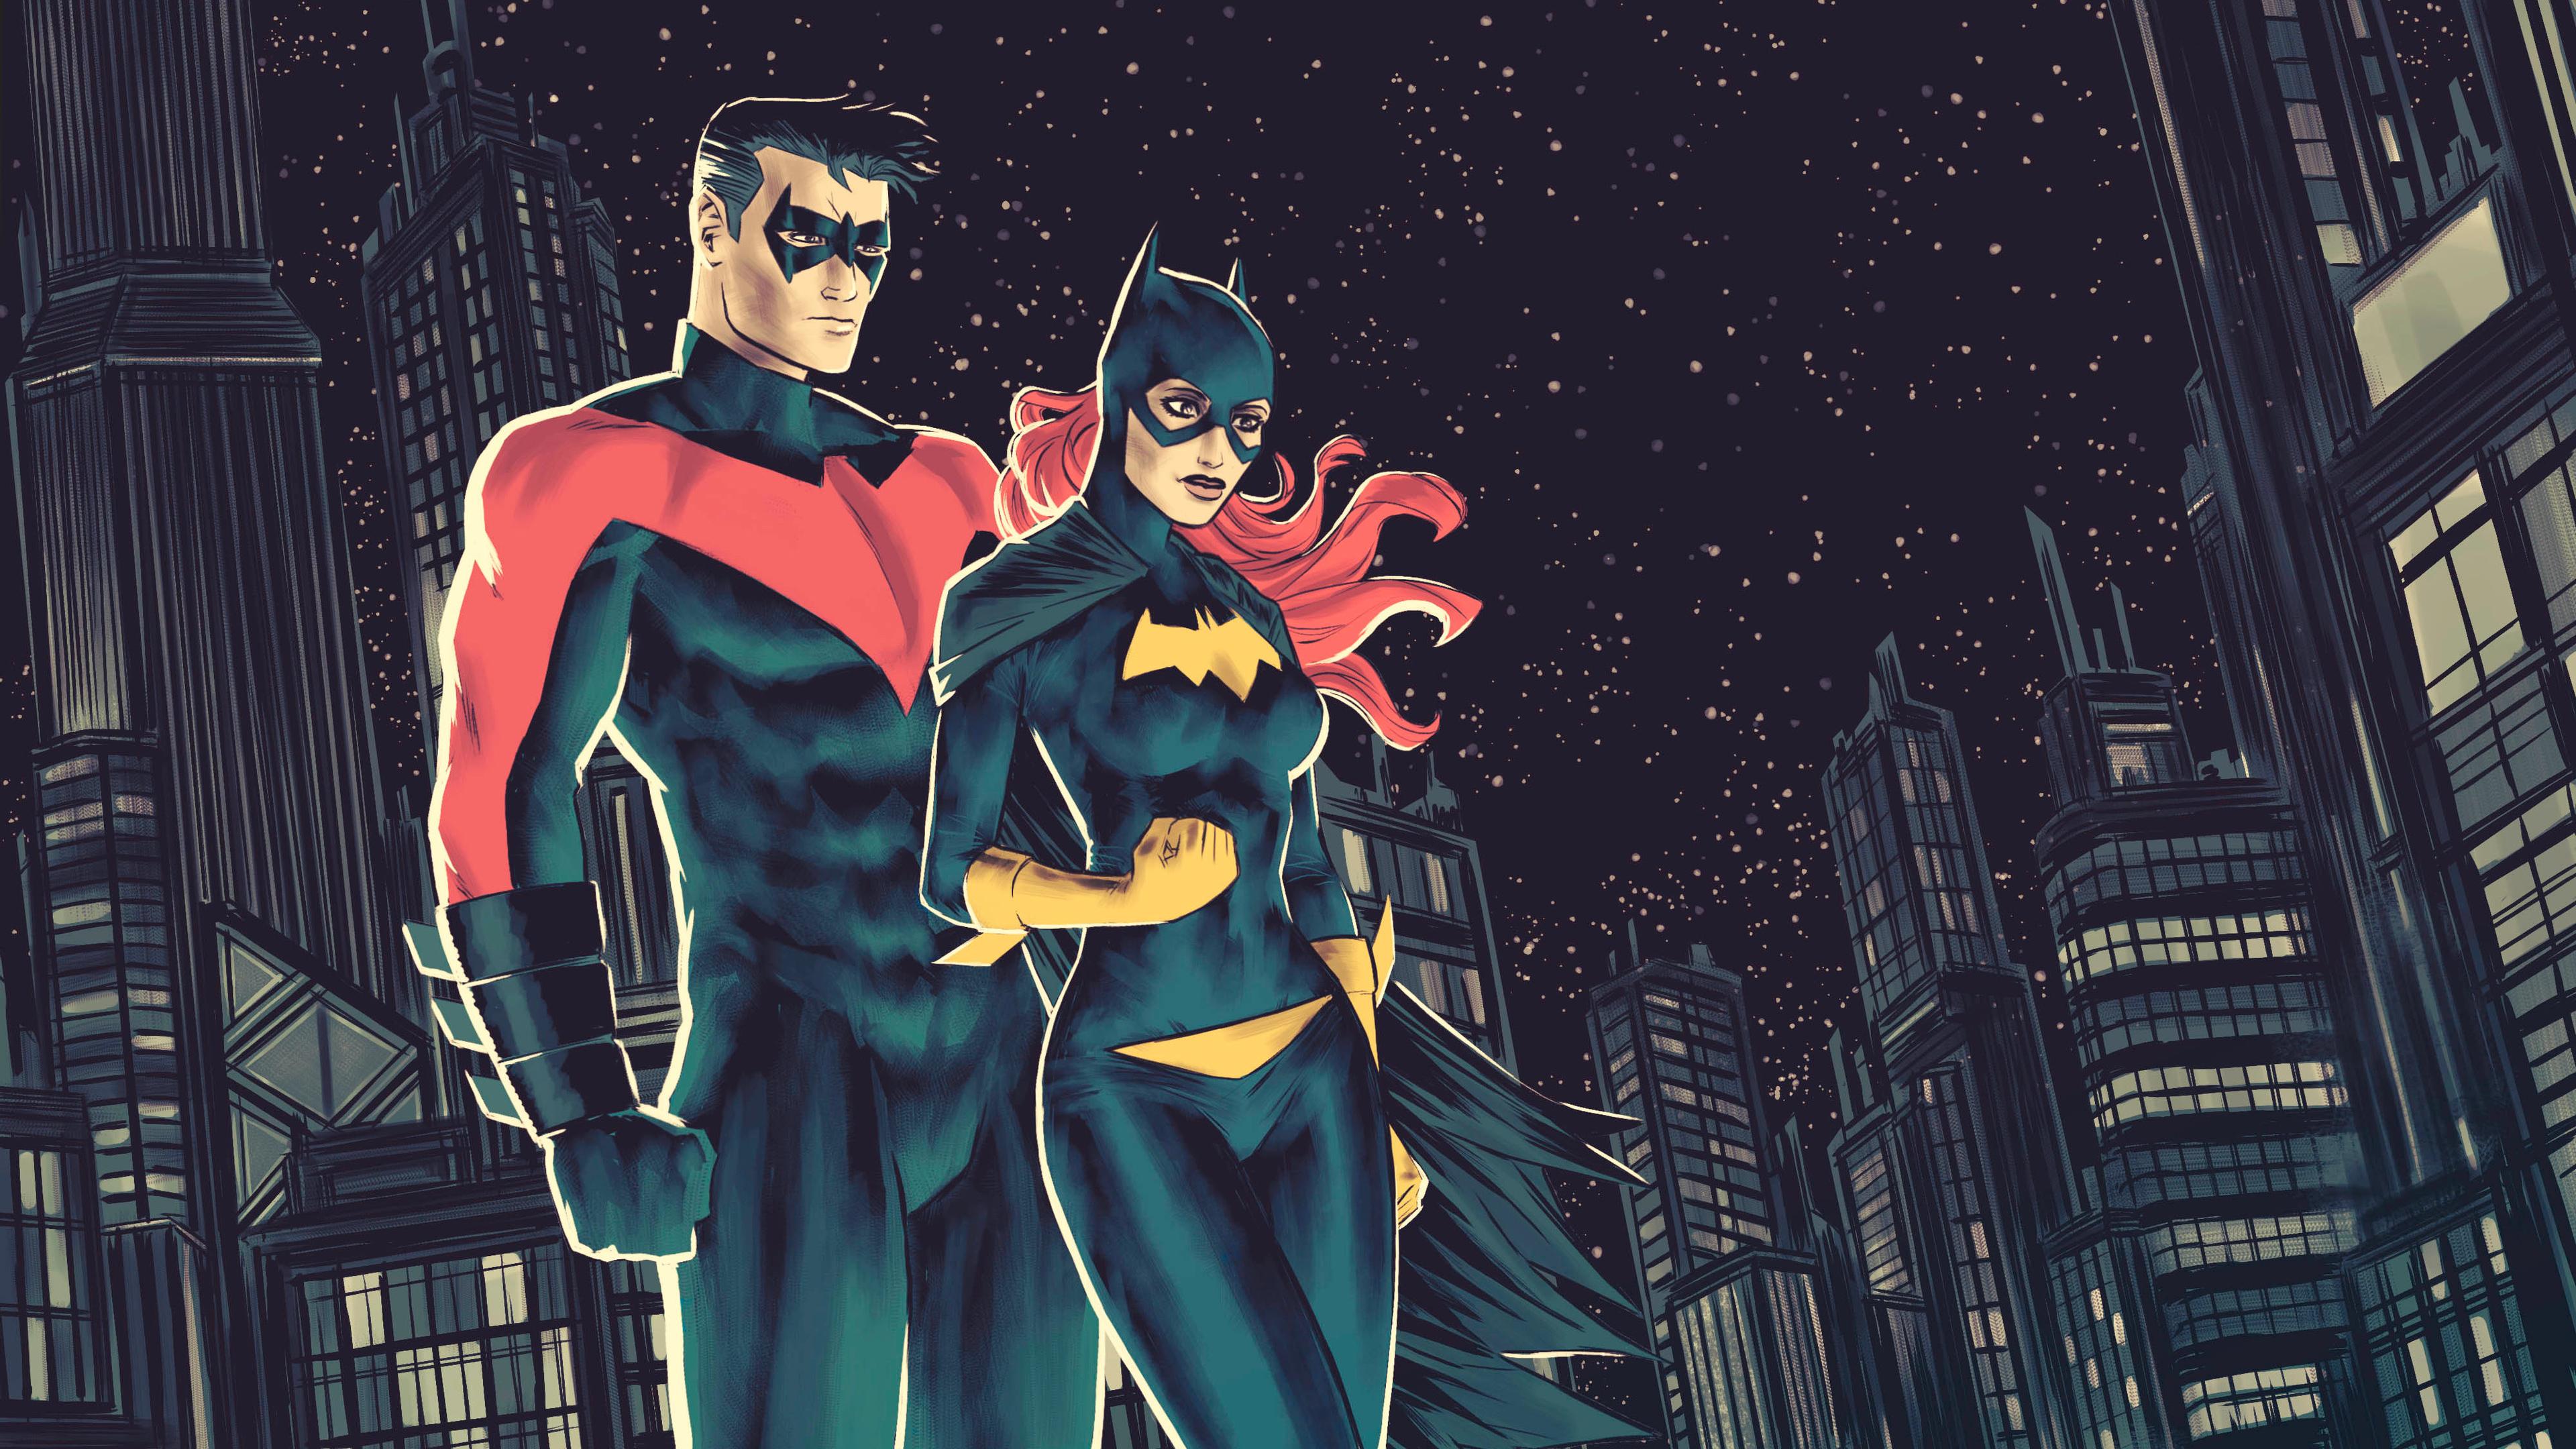 General 3840x2160 Nightwing Batgirl 4K ArtStation superhero artwork